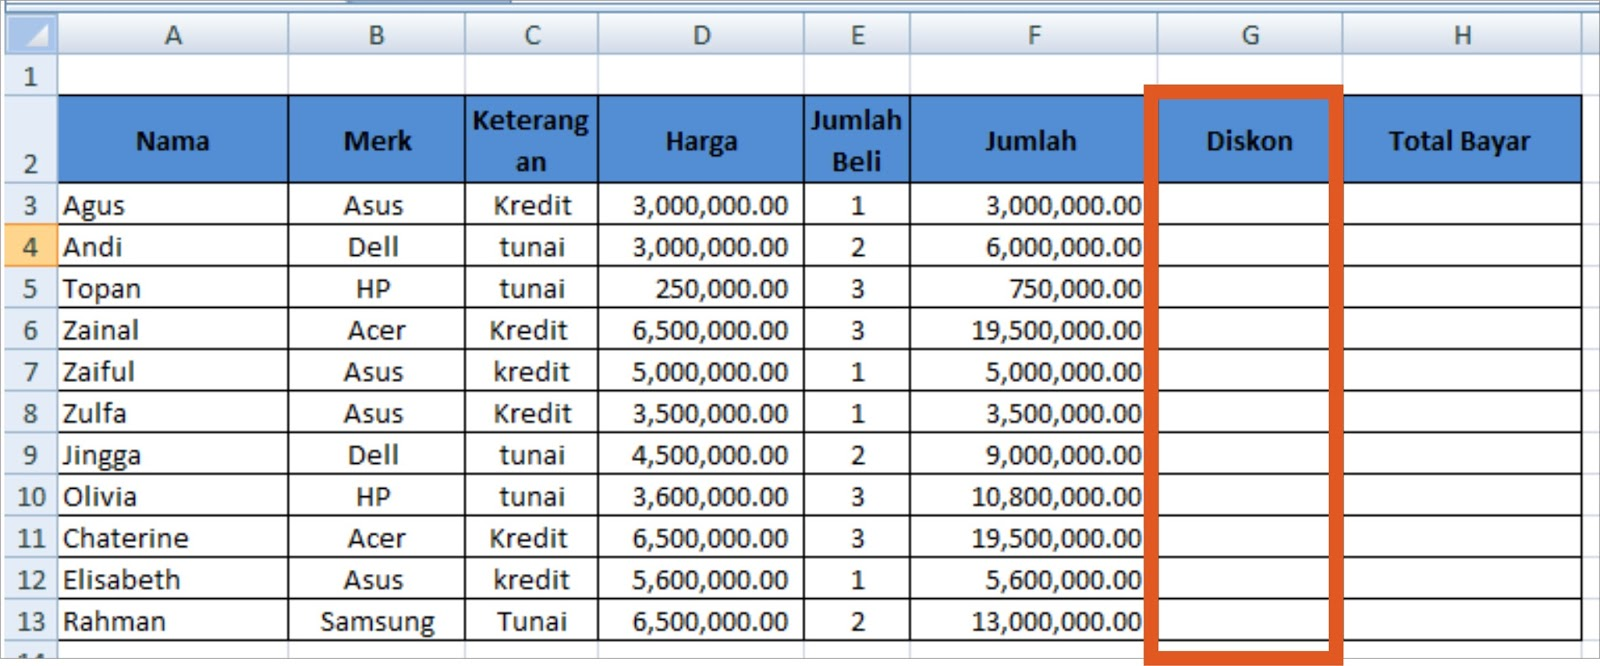 Soal Fungsi If Microsoft Excel 2007